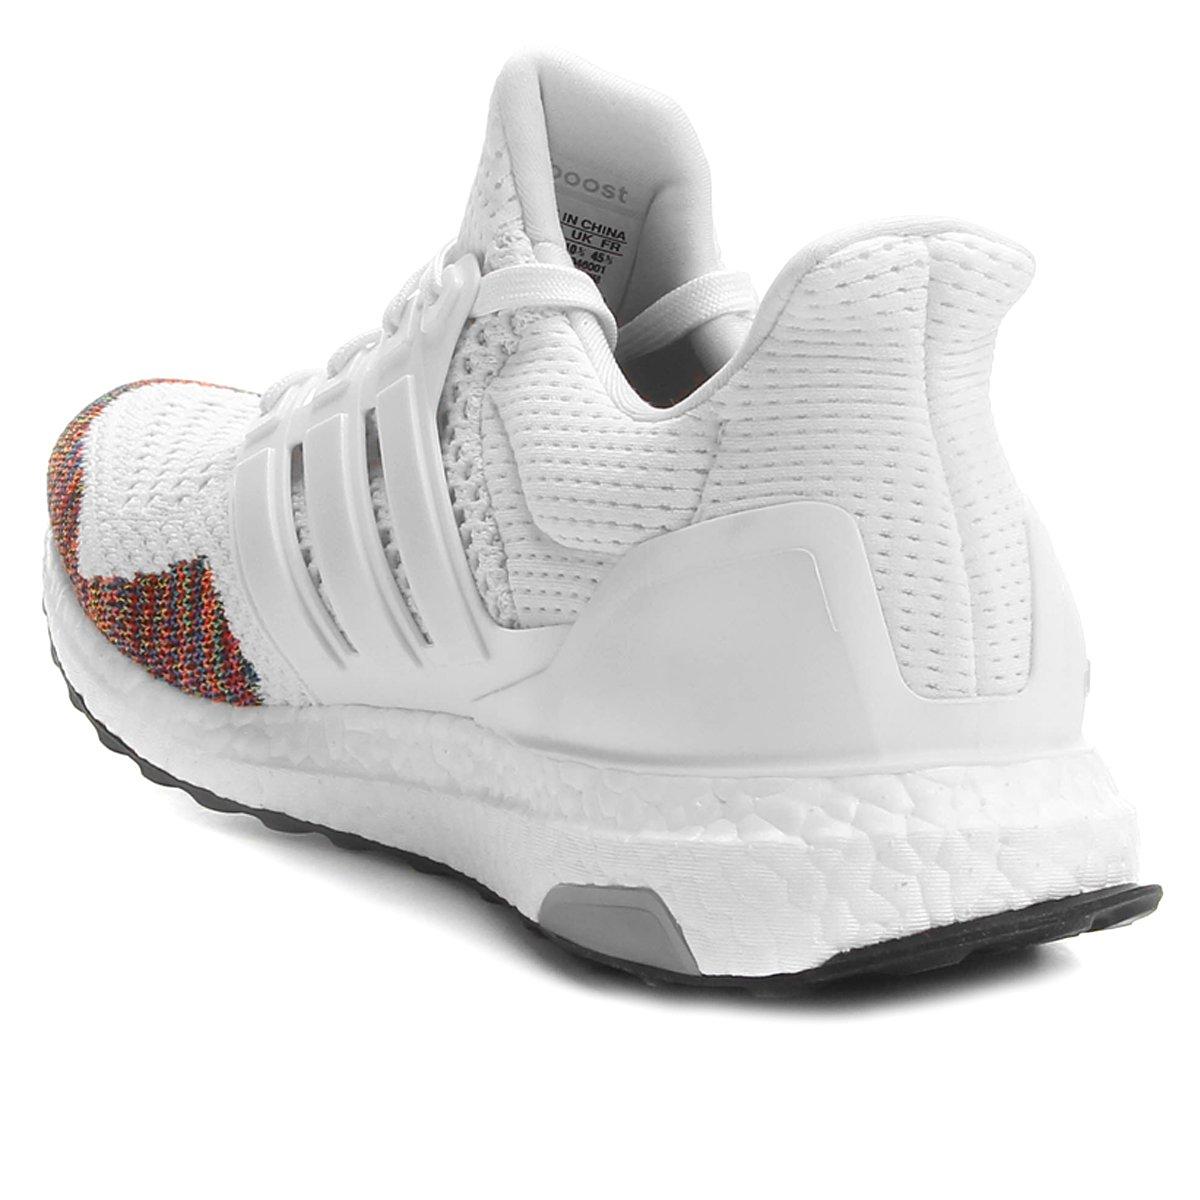 Tênis Adidas Ultra Boost Ltd - Compre Agora  56101371cb797